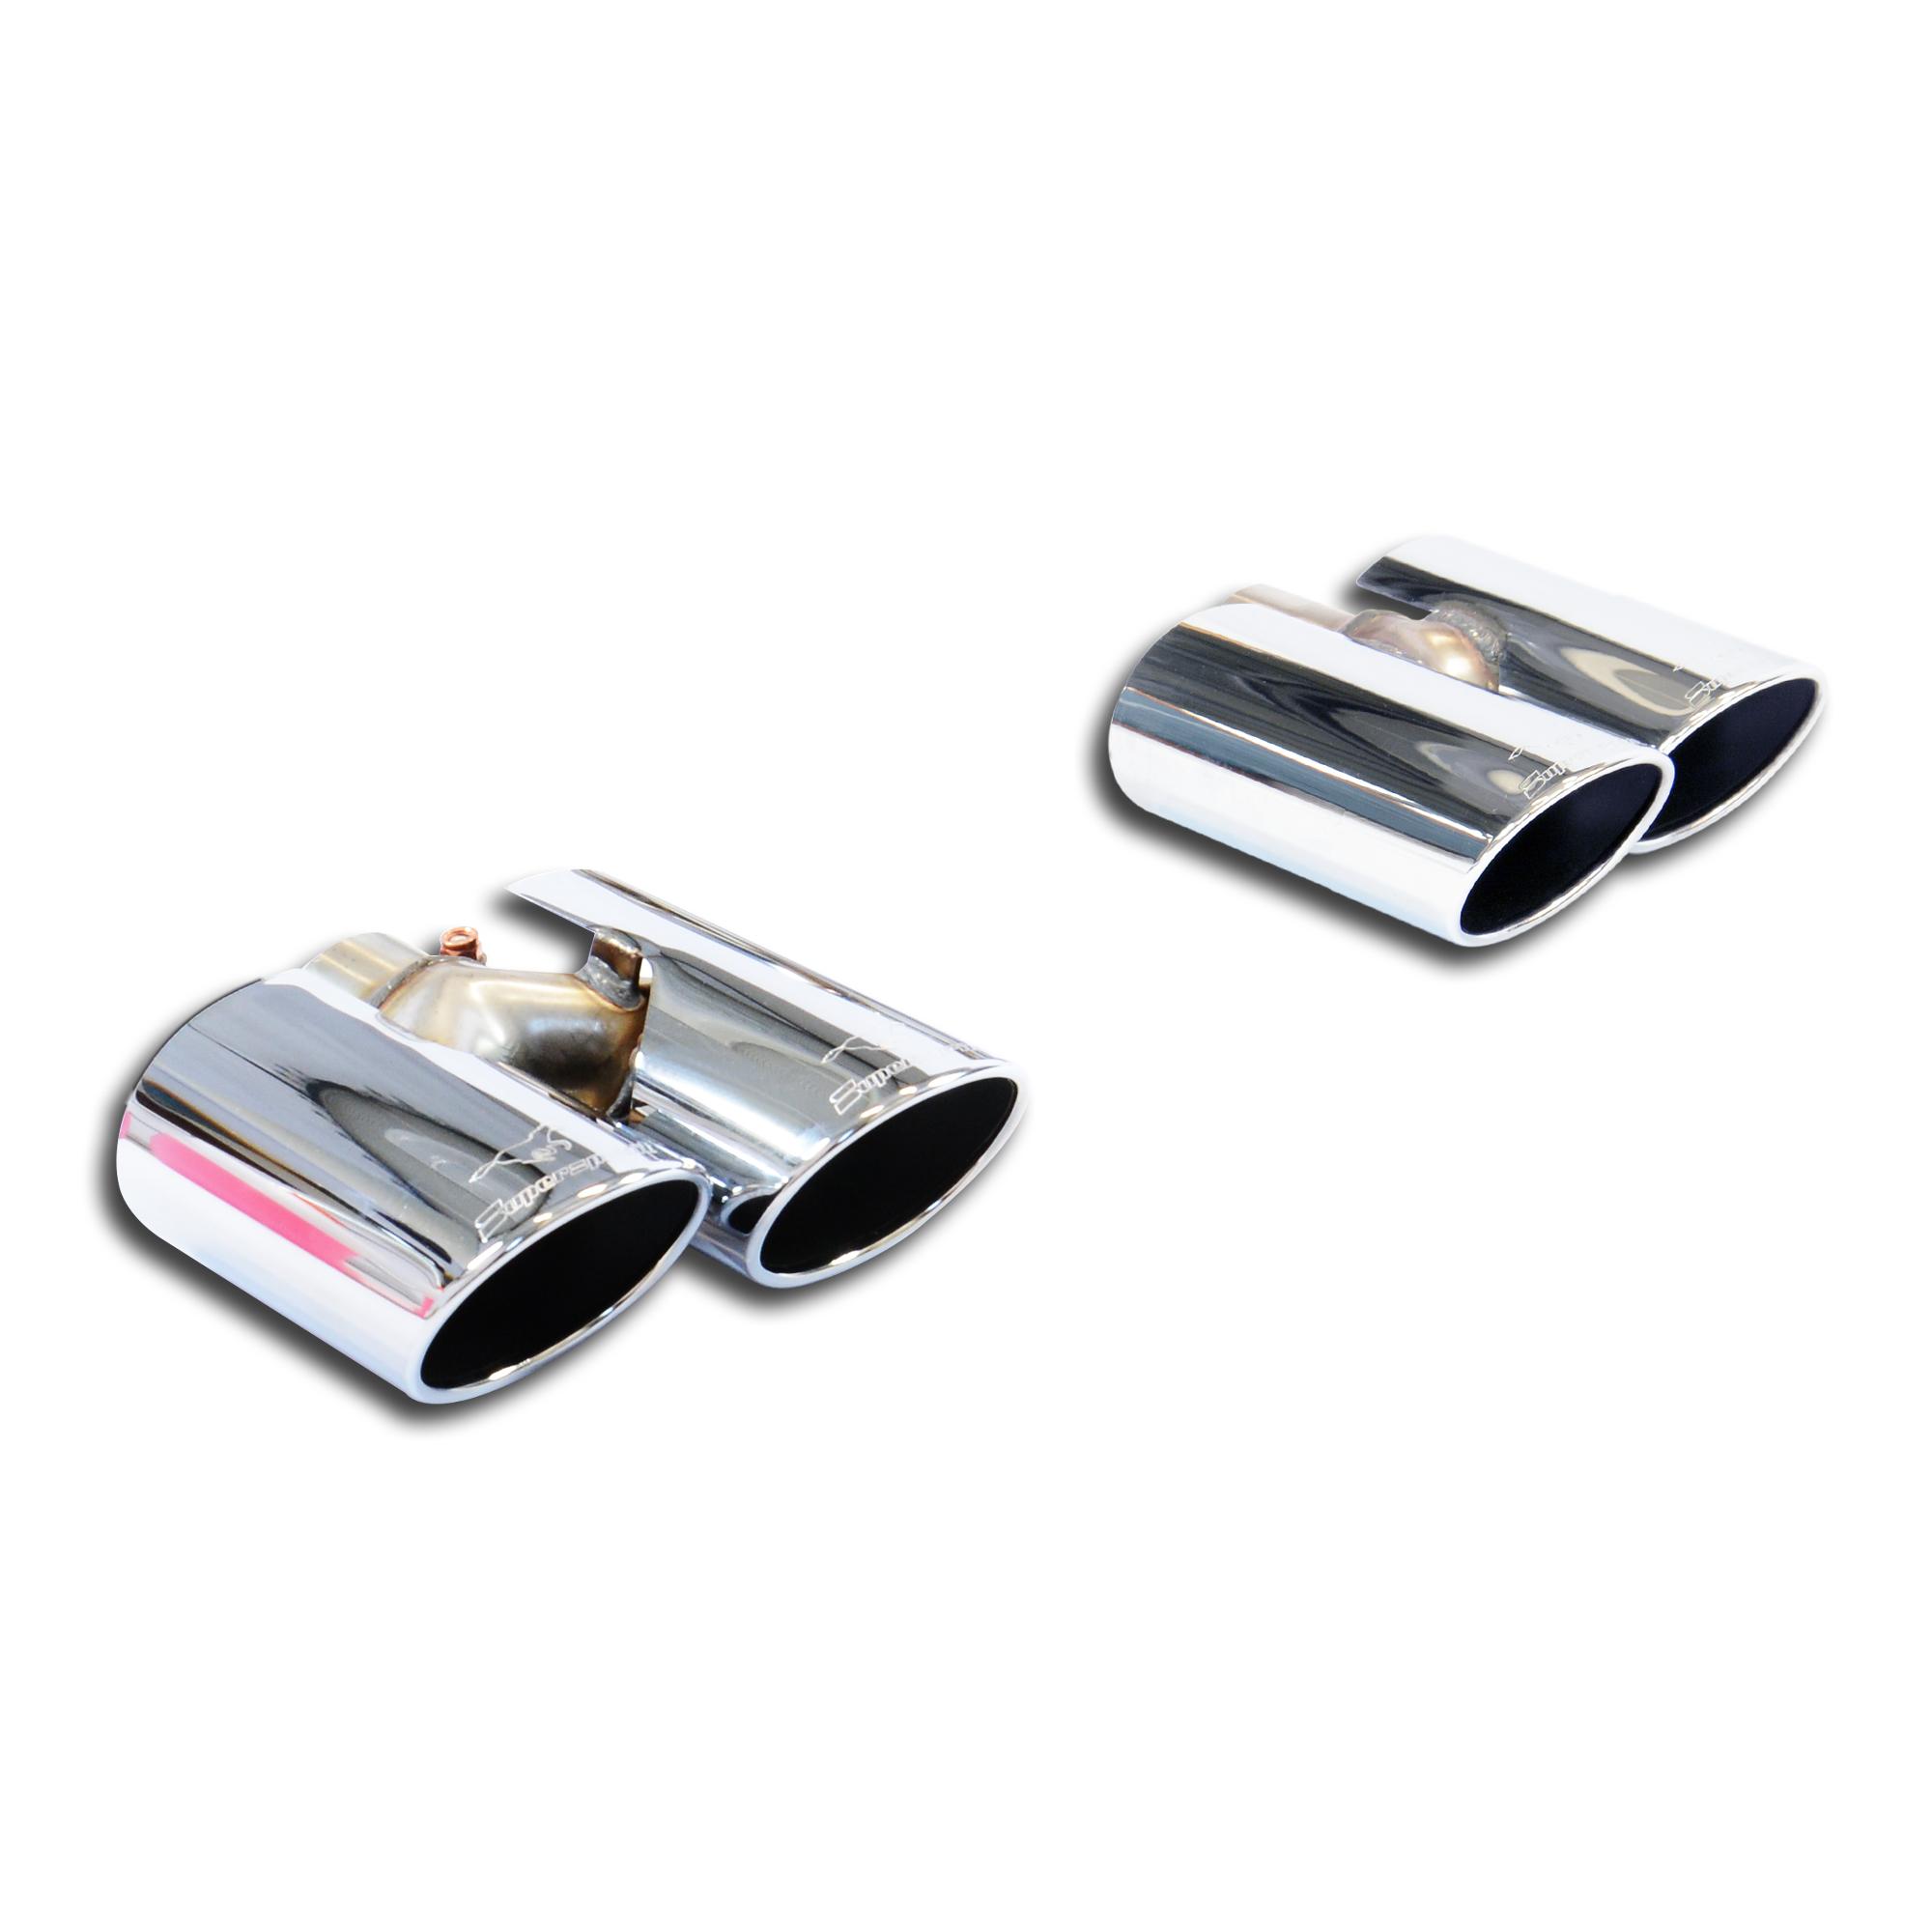 Kit 4 colas duplex doble de escape Derecha - Izquierda 120x80 AUDI TT Mk3 2.0 TFSI Quattro (230 Cv) 2015- Supersprint